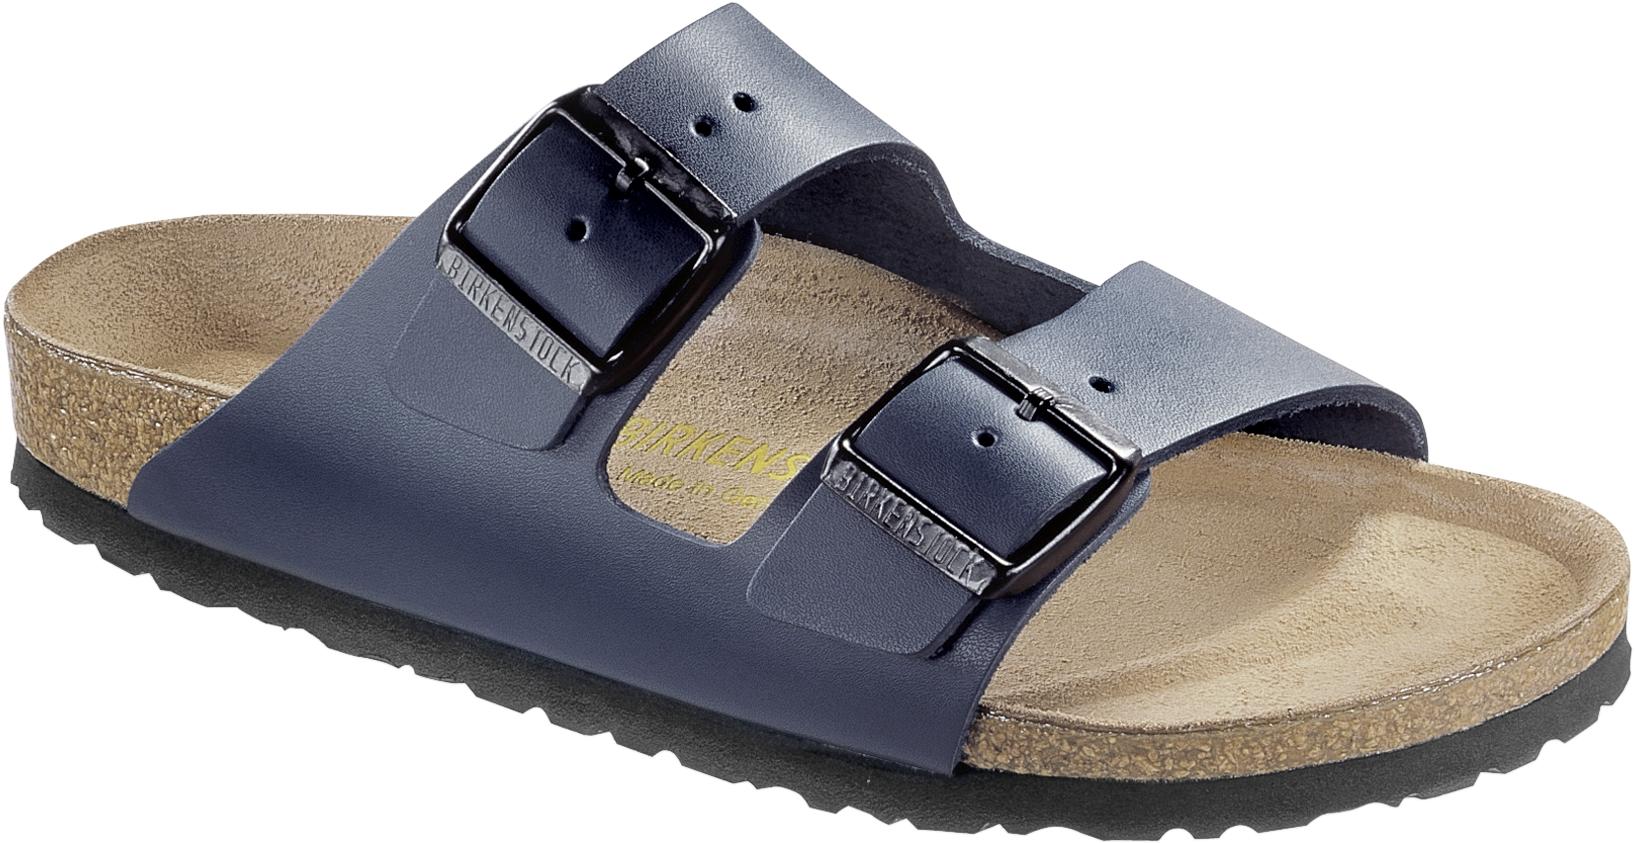 BIRKENSTOCK Pantolette Sandale Arizona blau Leder Gr. 35 50 051151 + 051153